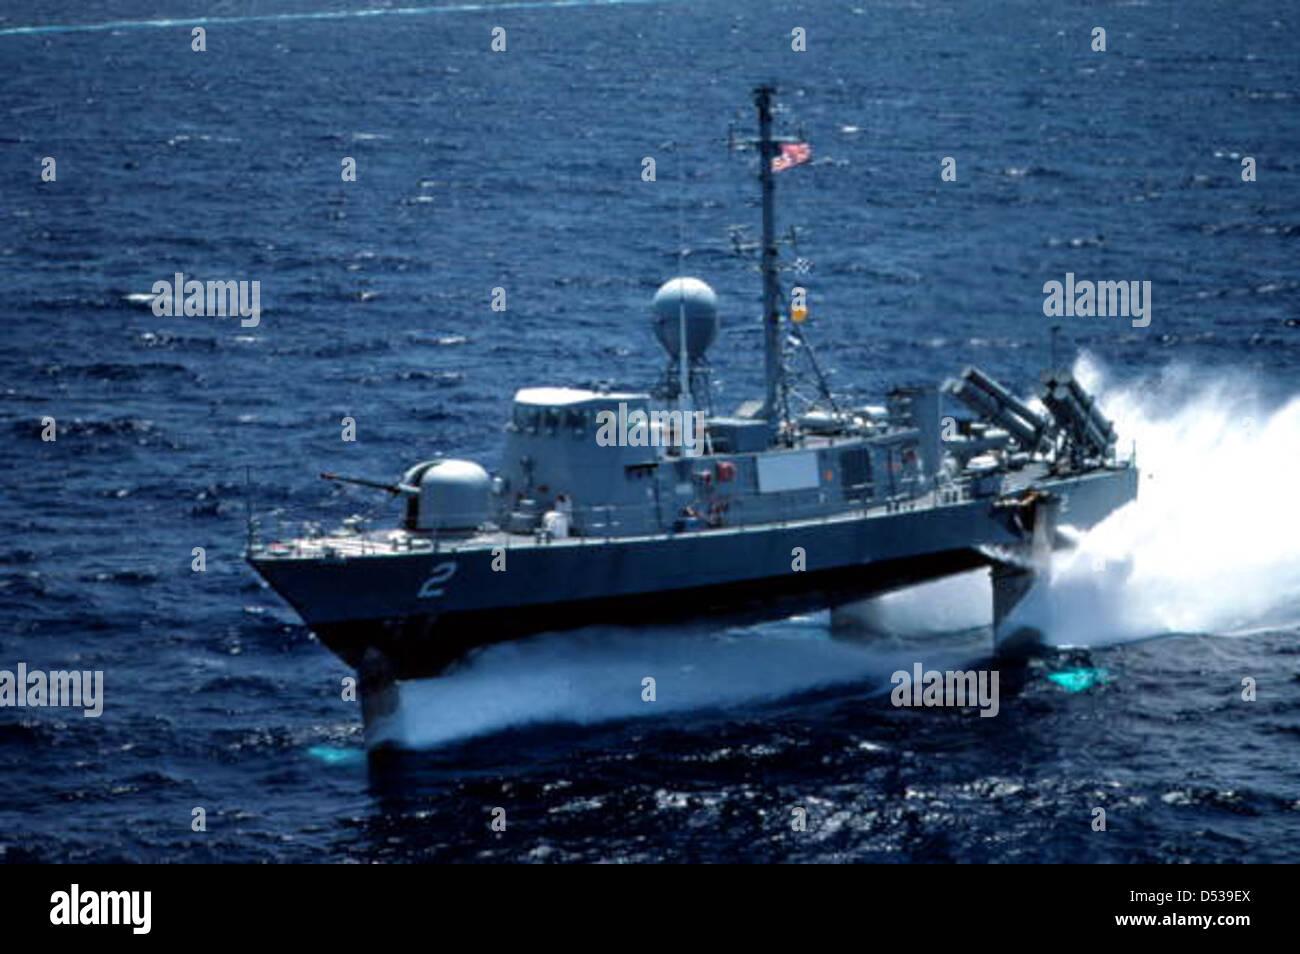 U S  Navy hydrofoil off Key West, Florida Stock Photo